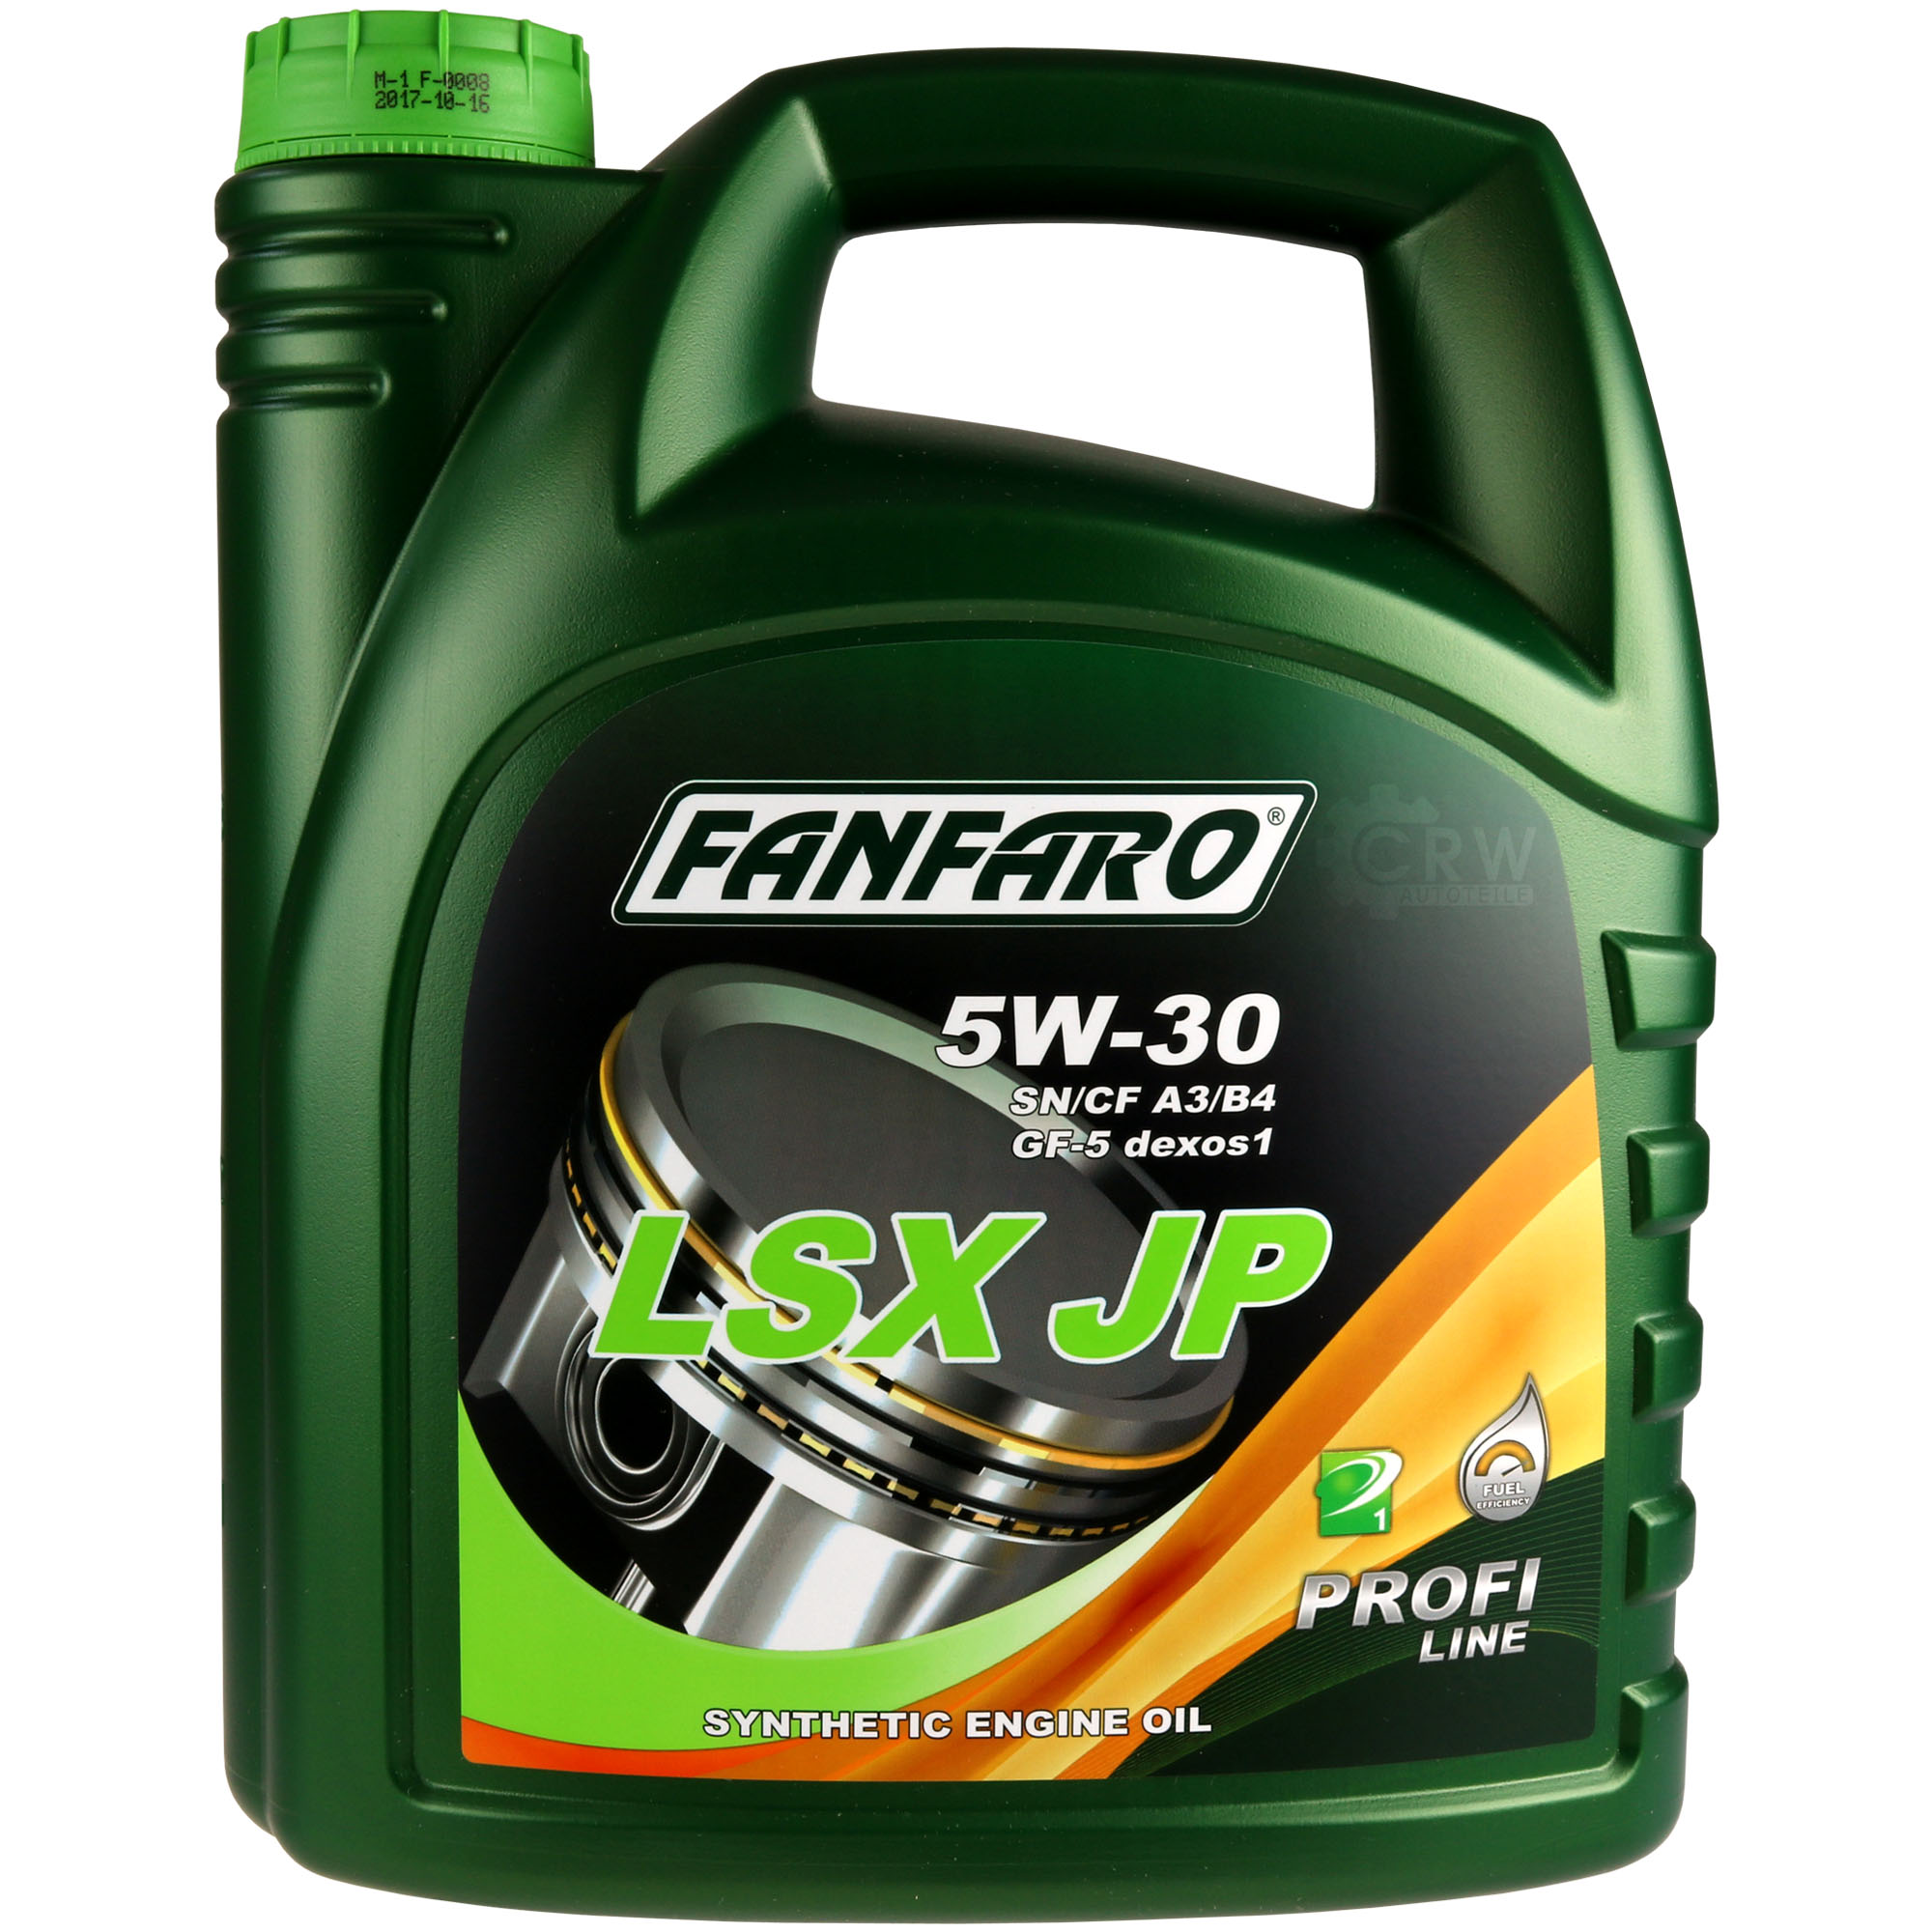 4 liter orignal fanfaro lsx jp 5w-30 api sn/cf motoröl engine oil Öl